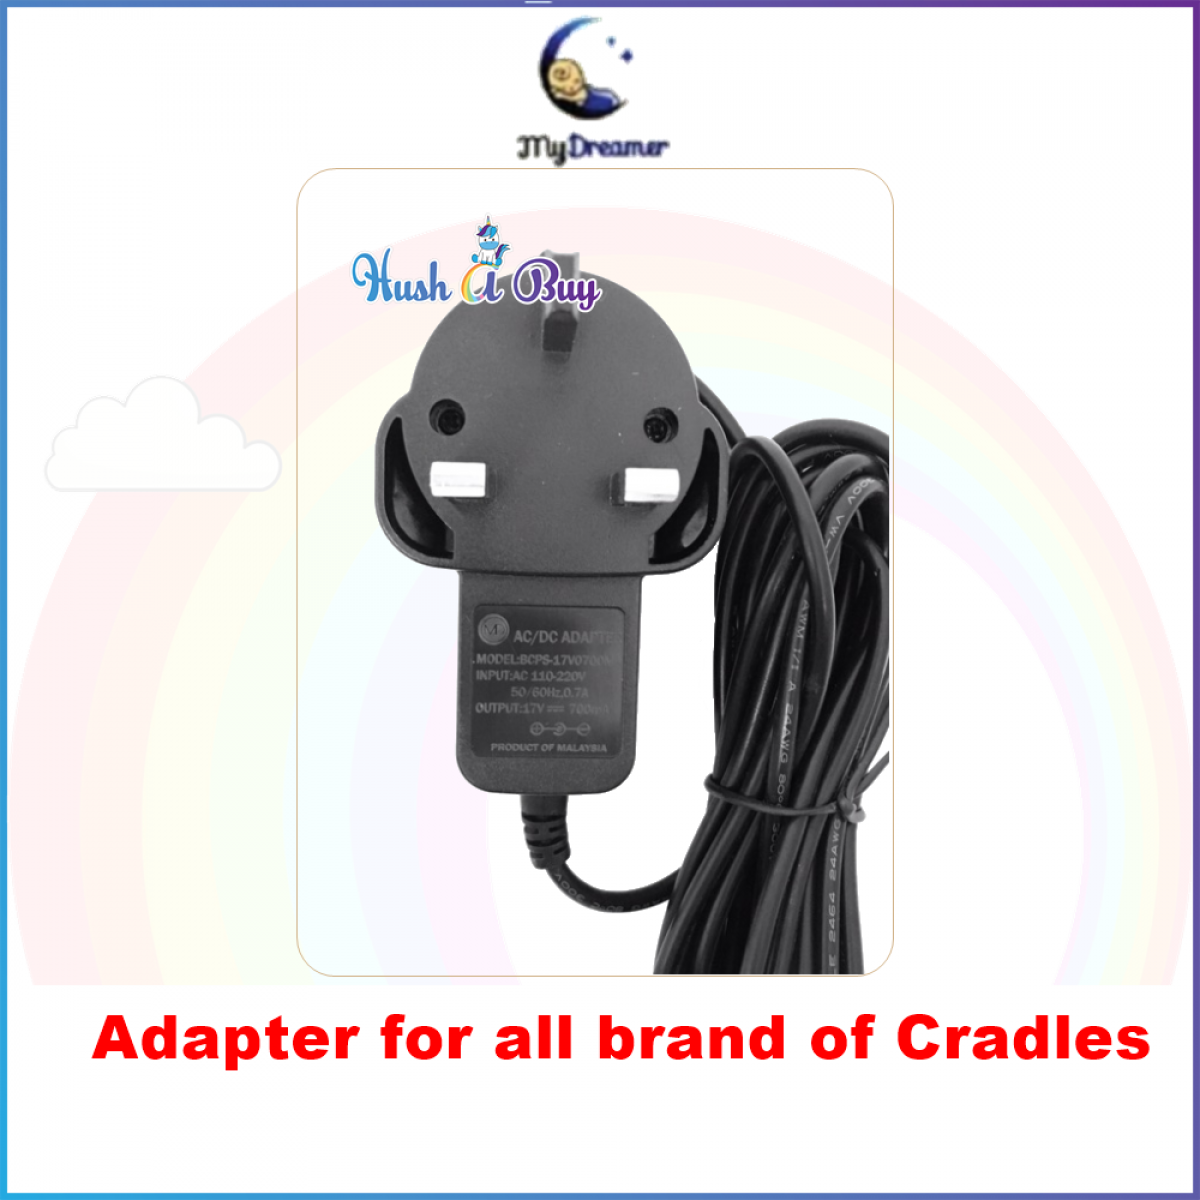 MYDREAMER Electronic Baby Cradle / Buaian Bayi Automatik - 1 Year Warranty